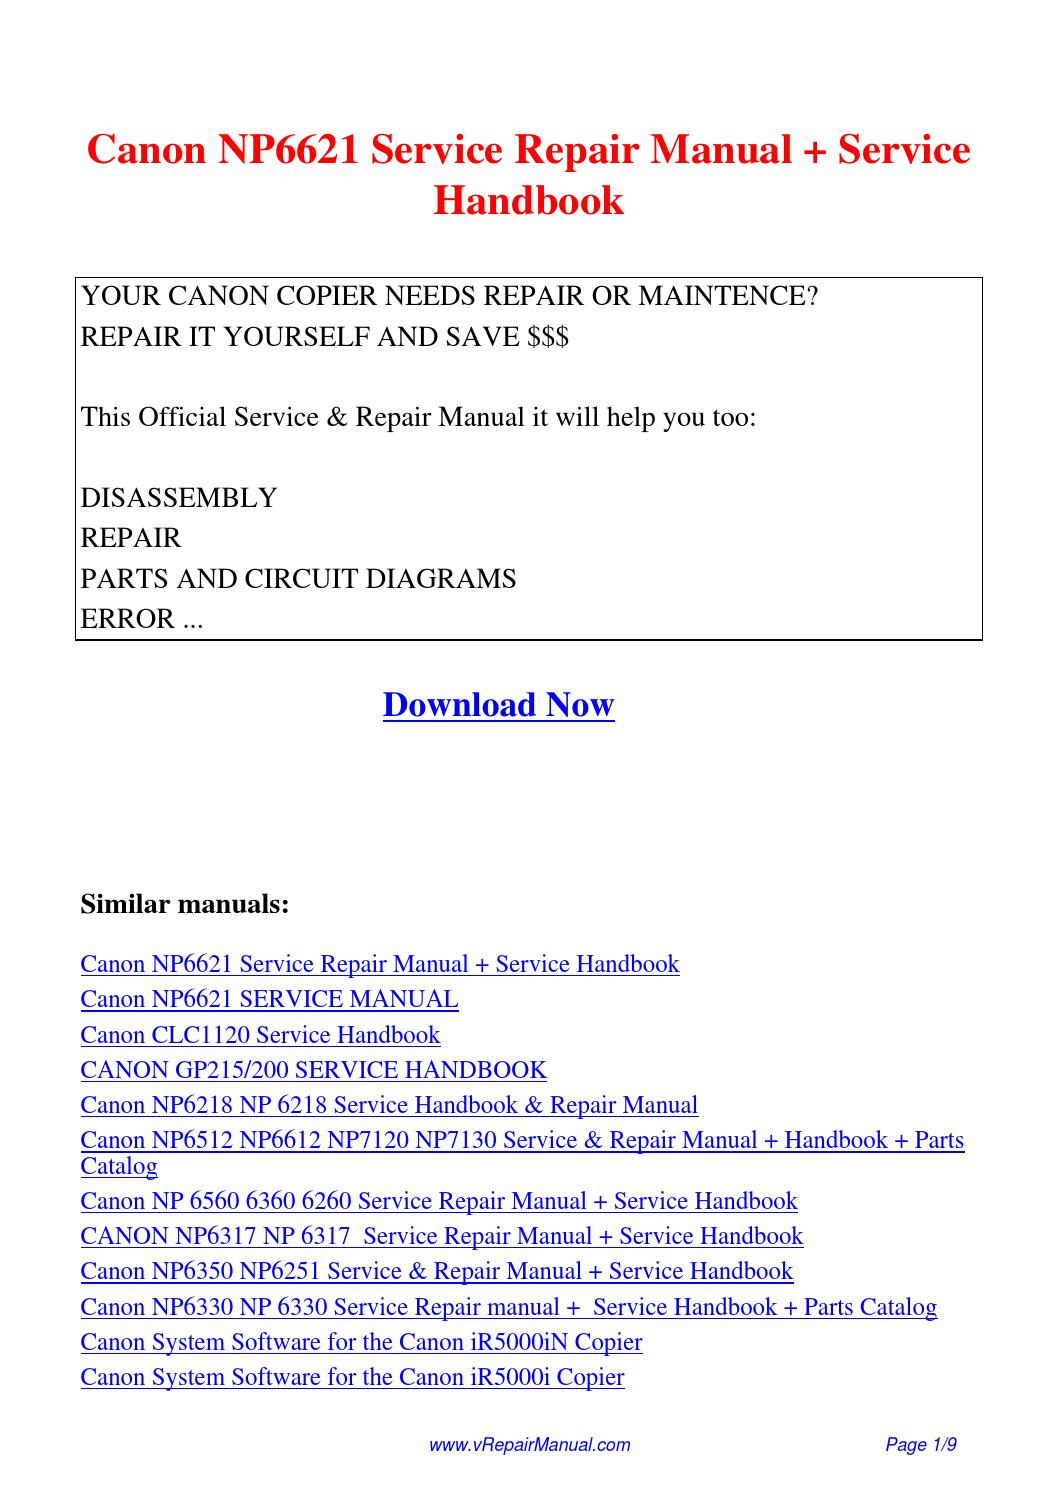 Canon NP6621 Service Repair Manual Service Handbook.pdf by Hong ting - issuu